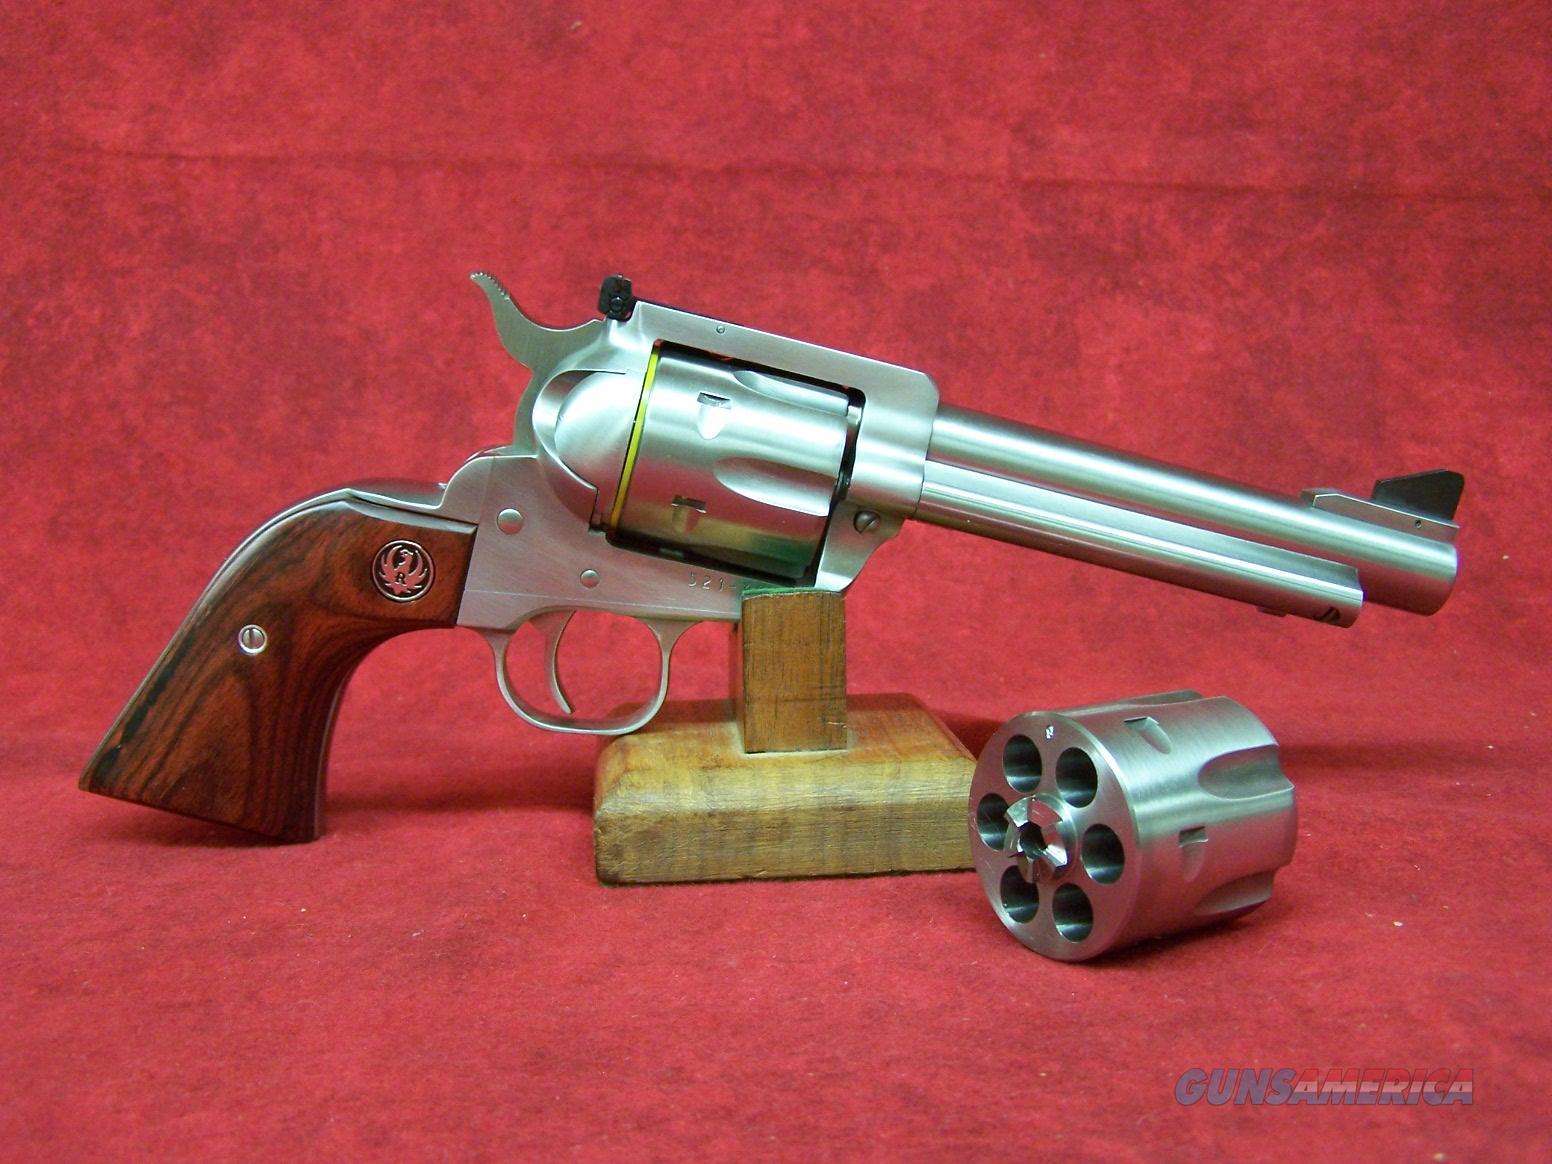 "Ruger New Model Blackhawk Flattop 357/9MM SS/WD 5.5"" barrel (05247)  Guns > Pistols > Ruger Single Action Revolvers > Blackhawk Type"